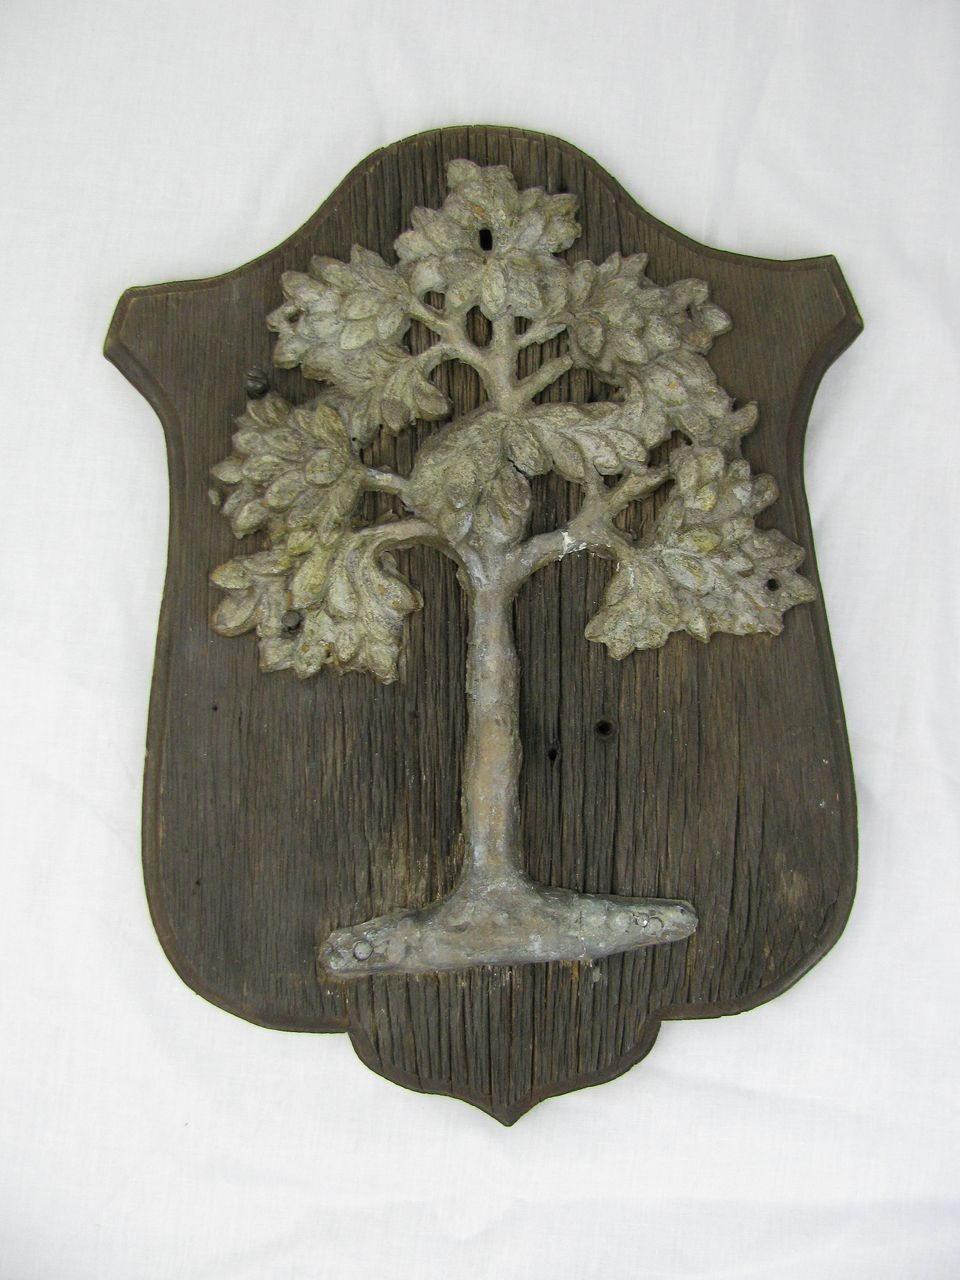 Antique Original American Fire Mark Green Tree Mutual Assurance Co. Philadelphia PA Cast Iron on Wood Frame 1784